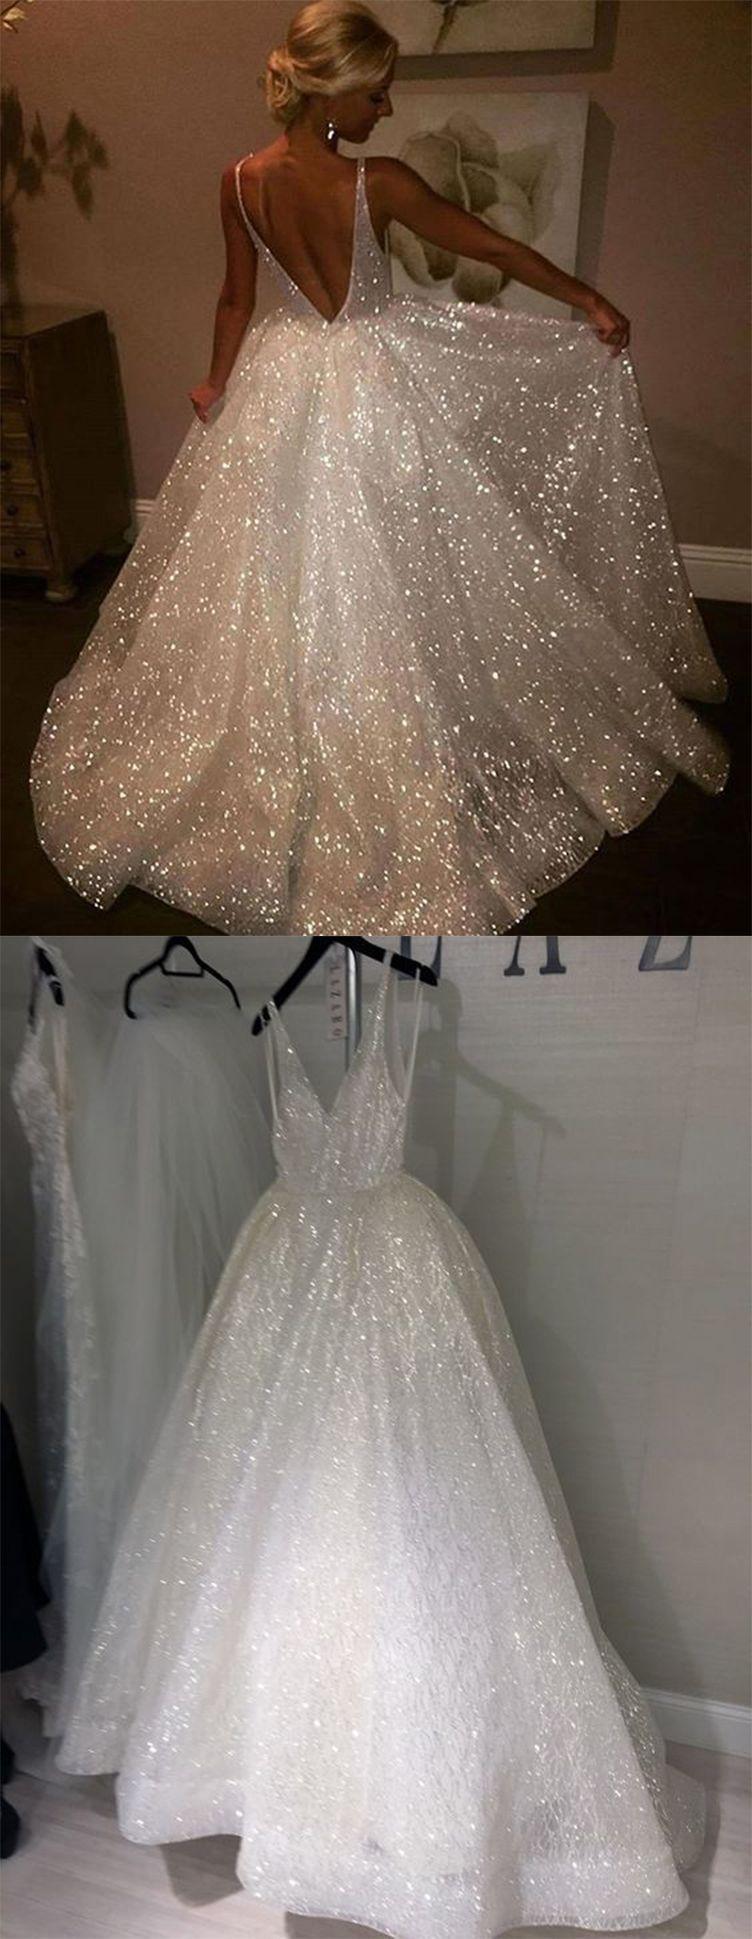 Charming prom dressesbackless prom dresselegant prom dresses